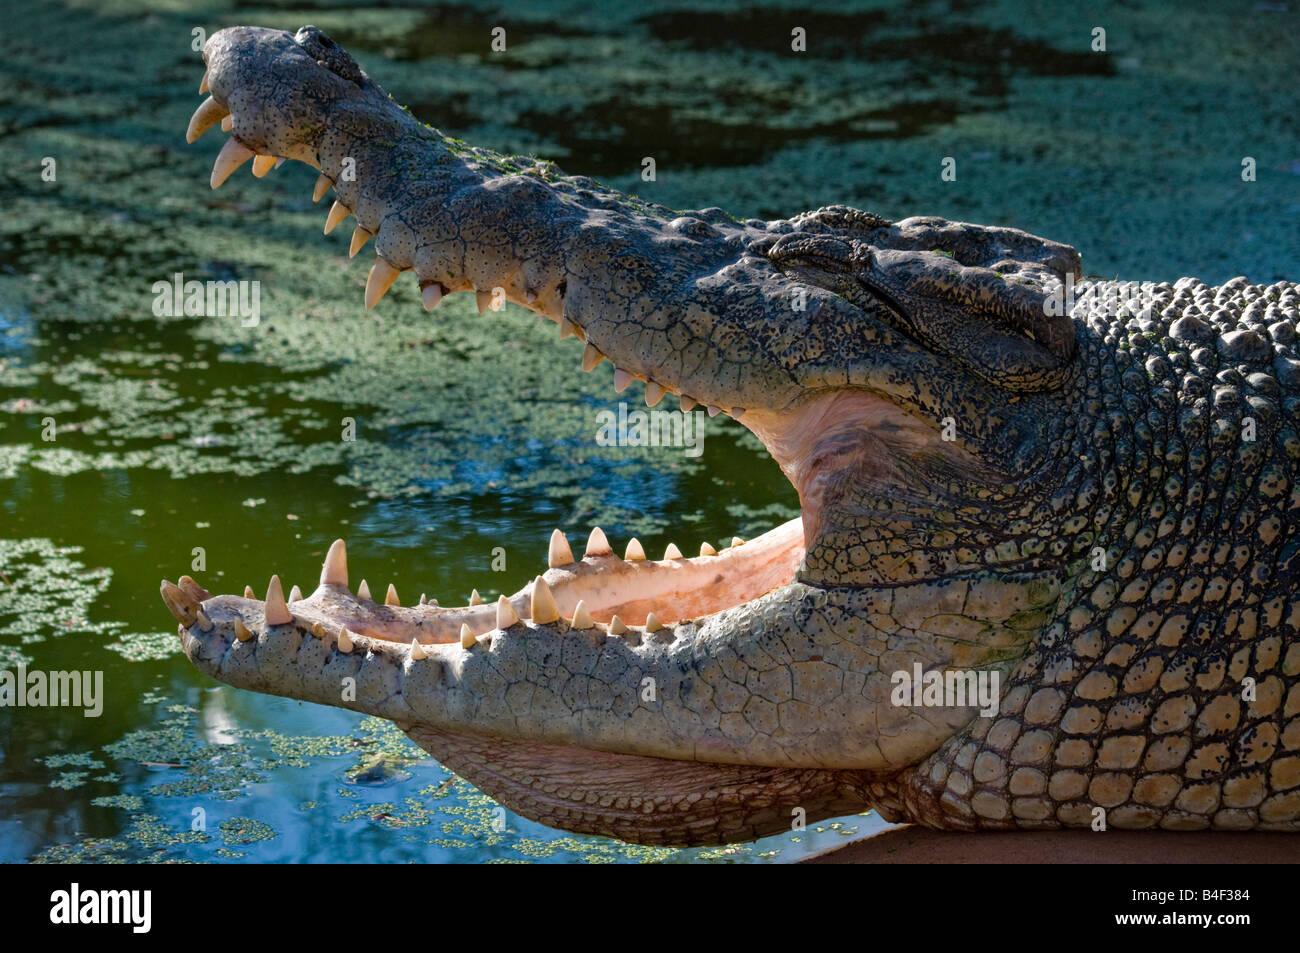 Gaping jaws of the Australian Estuarine salt water crocodile Crocodylus porosus - Stock Image